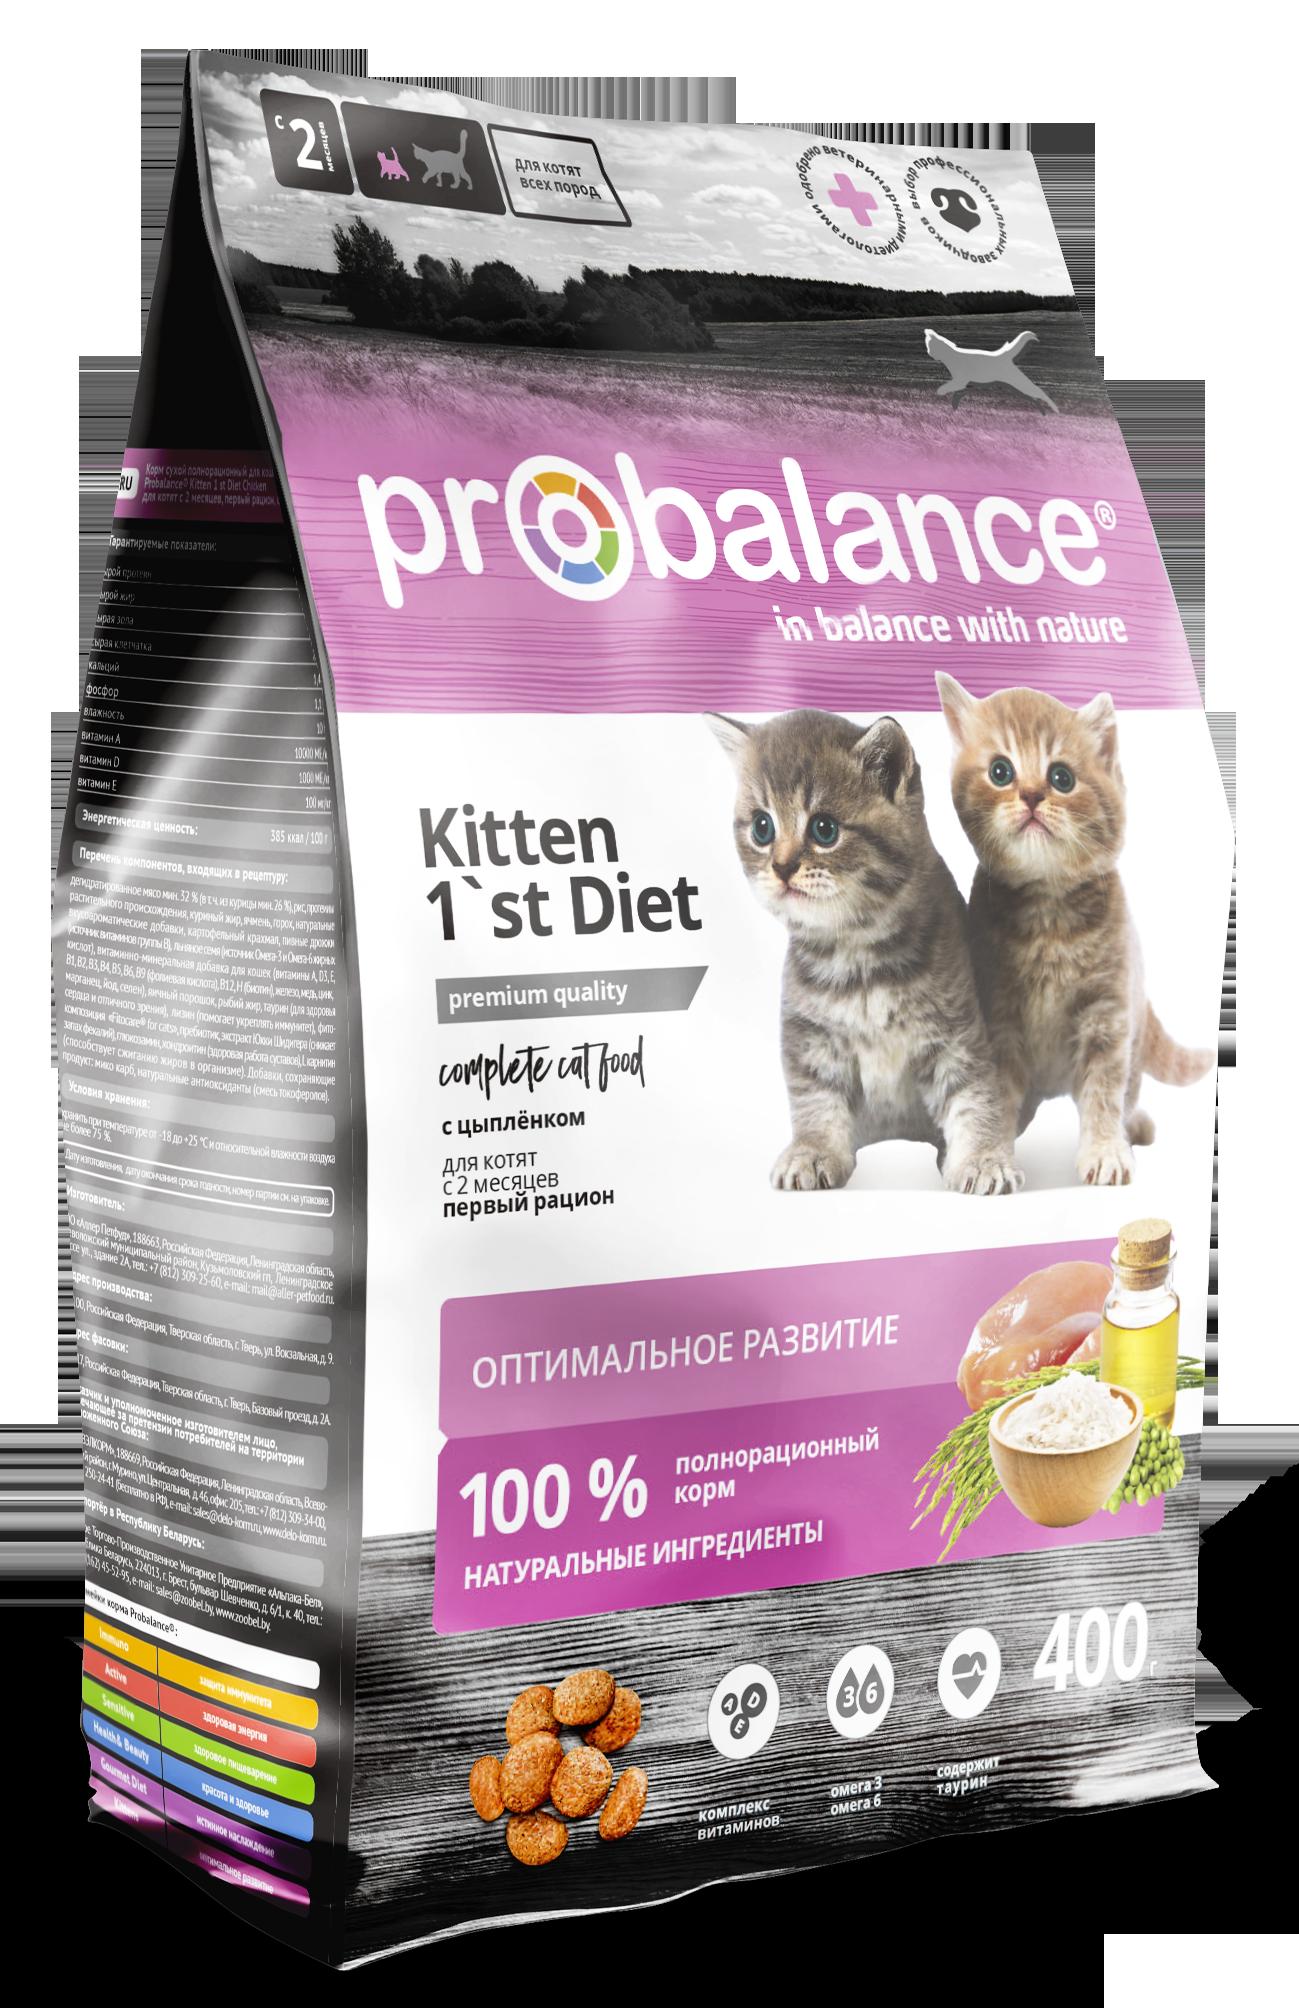 ProBalance Корм ProBalance 1`st Diet Kitten для котят, с цыпленком 400_PB_kitten_Chicken.png